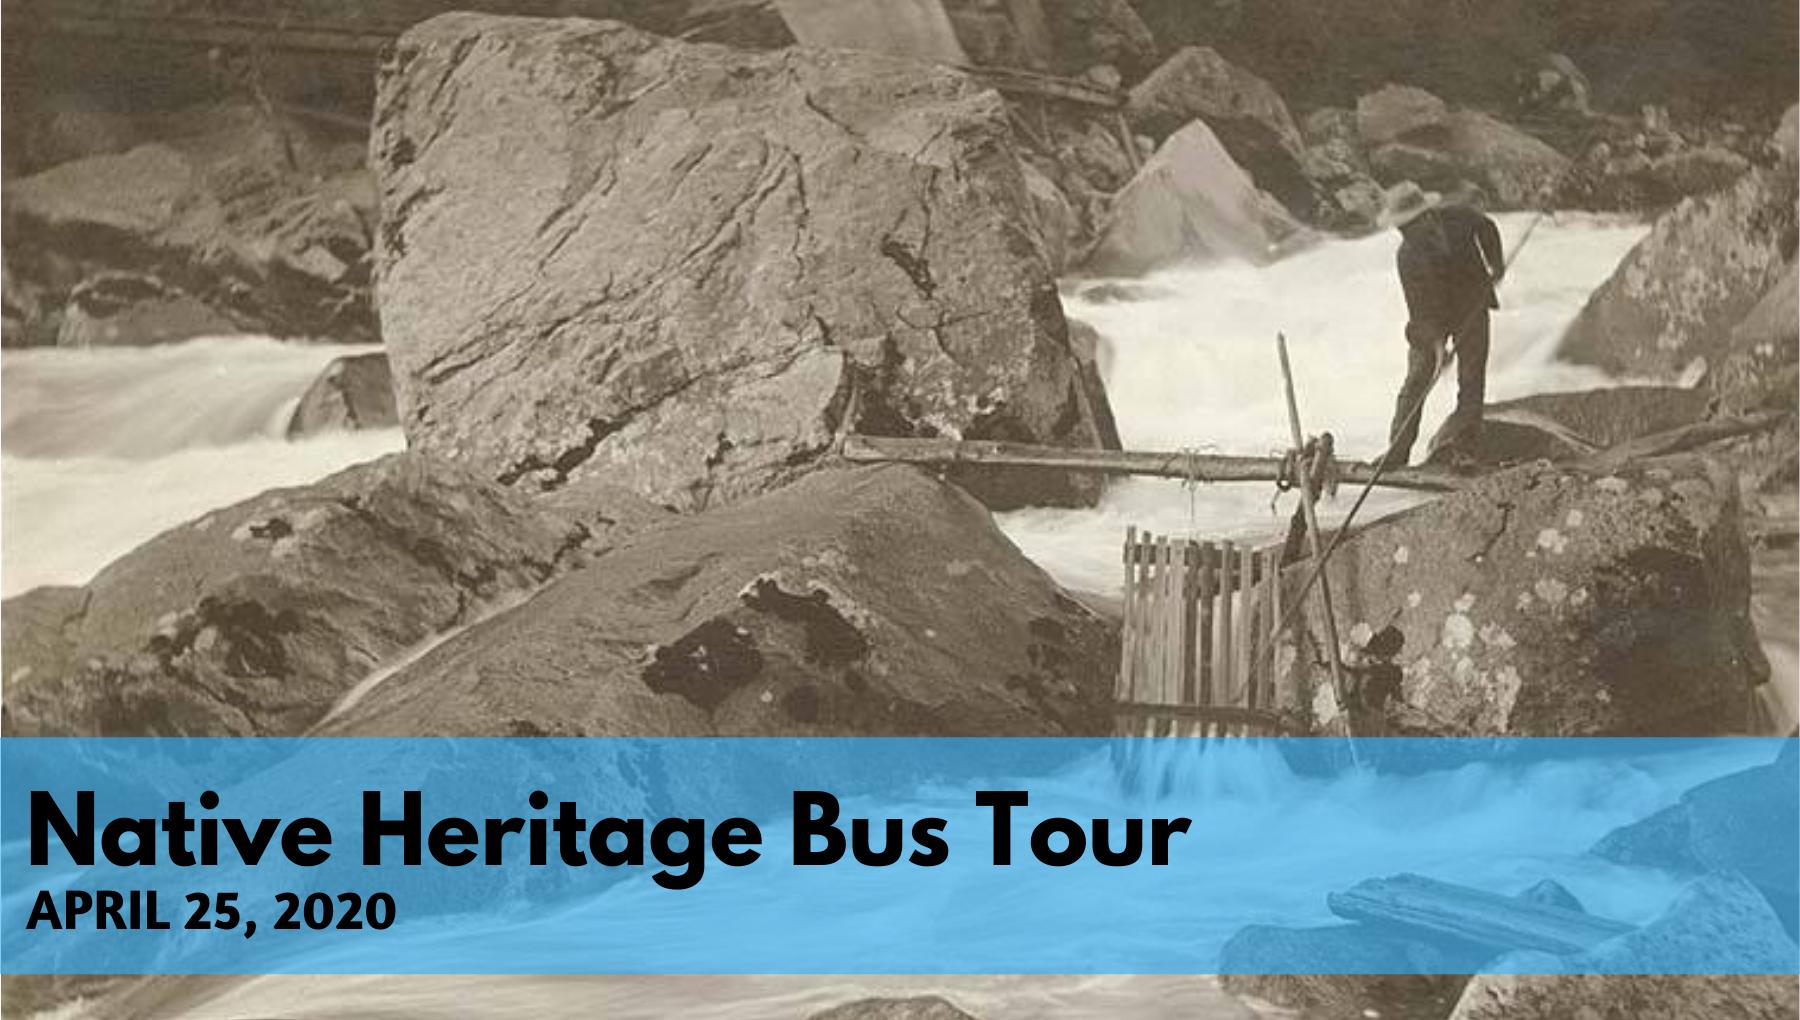 Native Heritage Bus Tour April 25